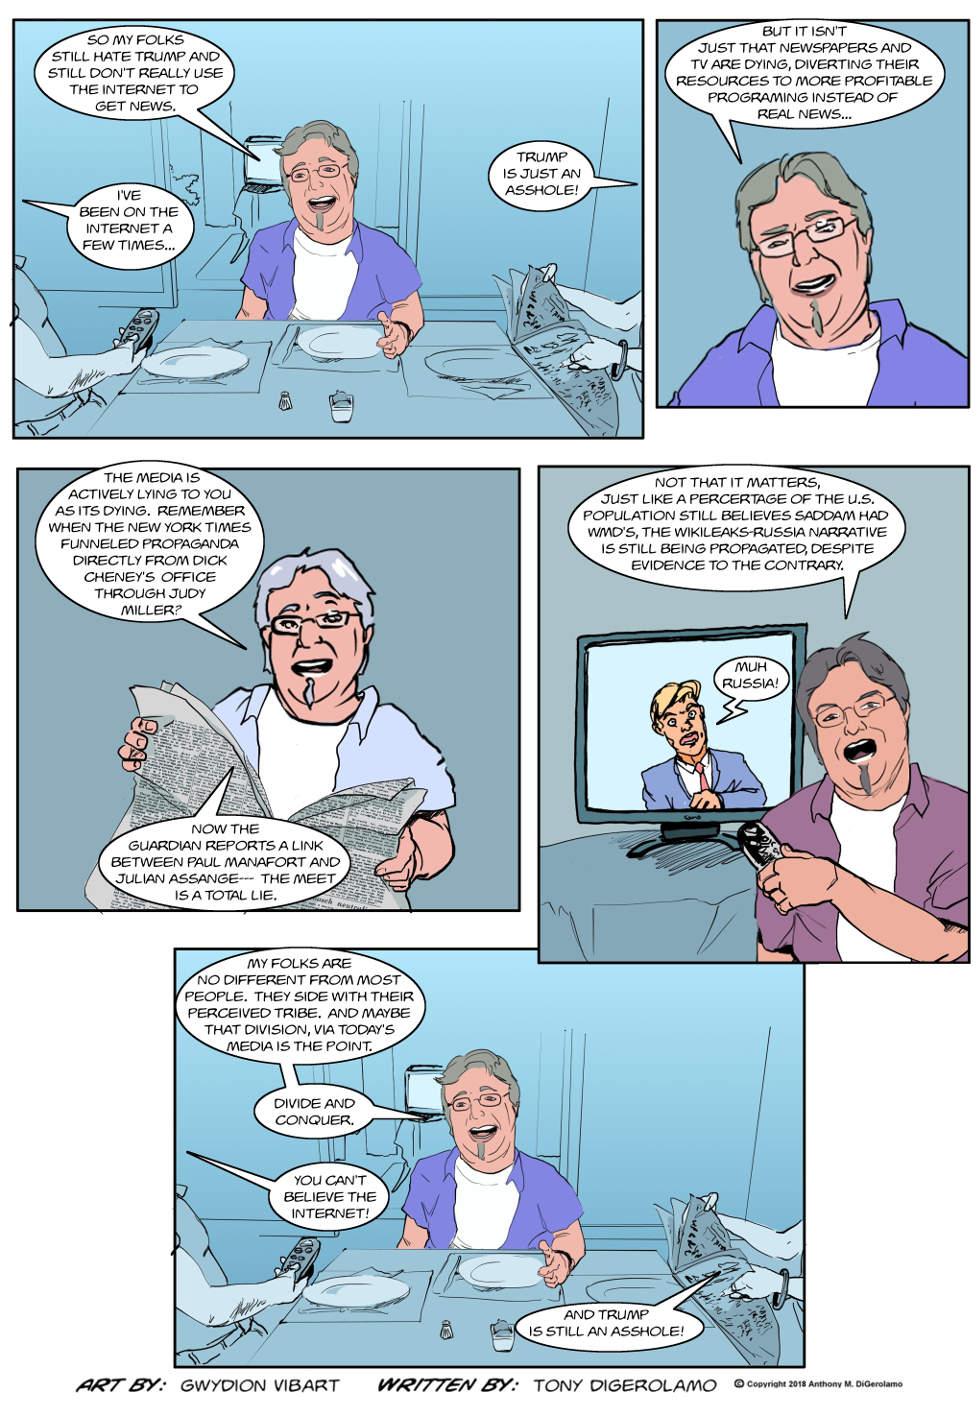 The Antiwar Comic:  The Perceived Narrative